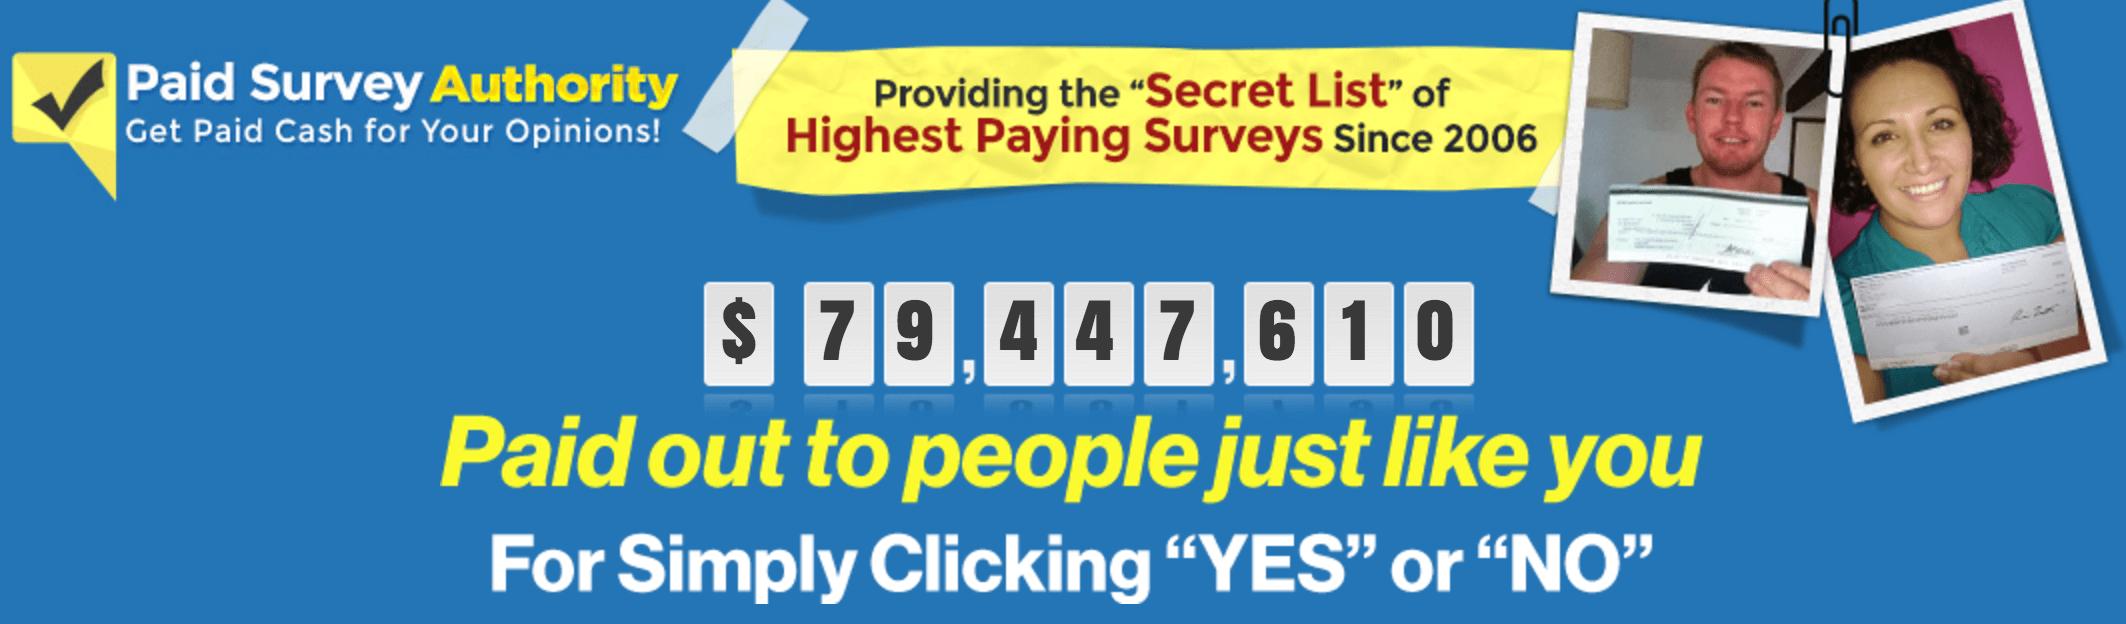 paid-survey-authority-scam-logo